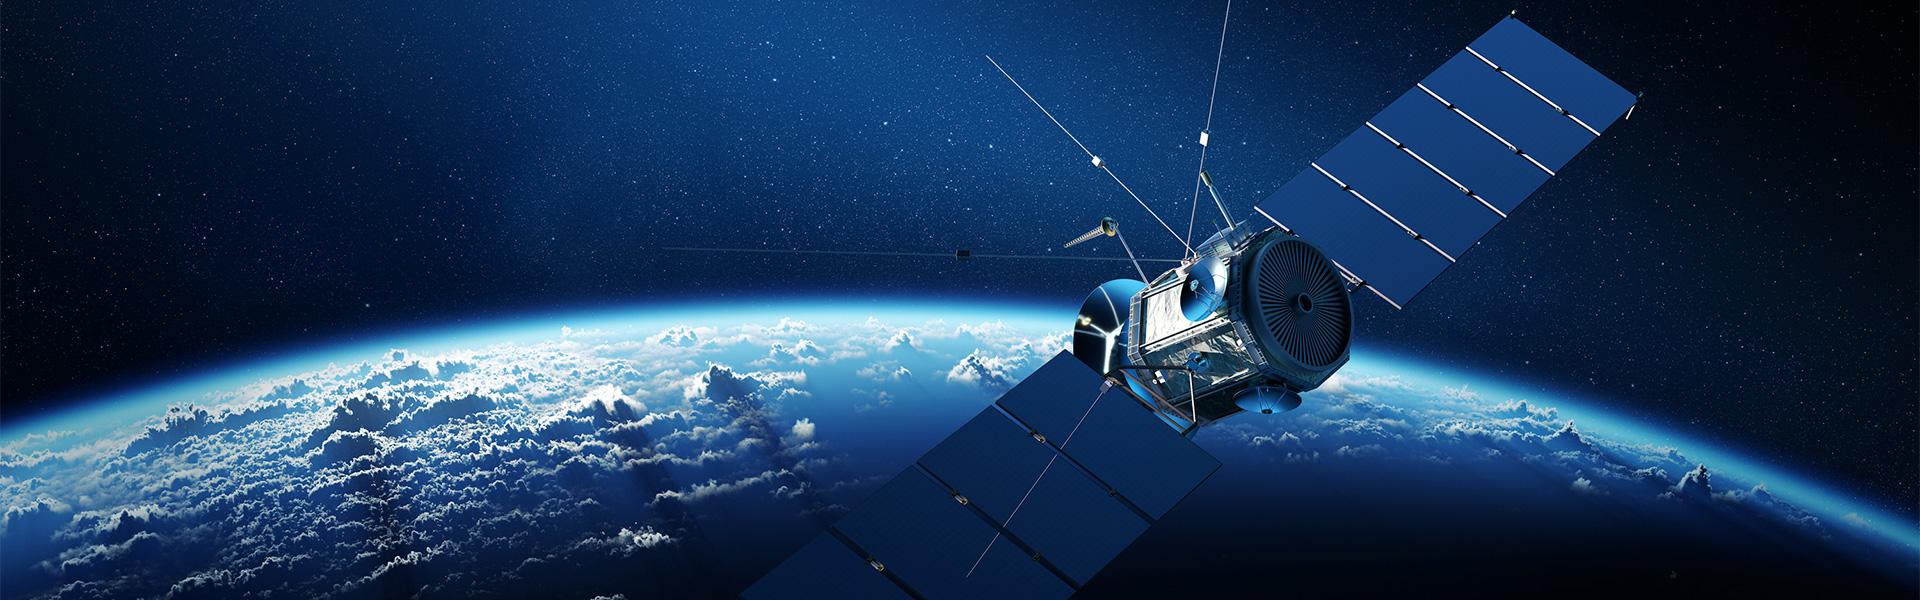 Communications satellite orbiting Earth